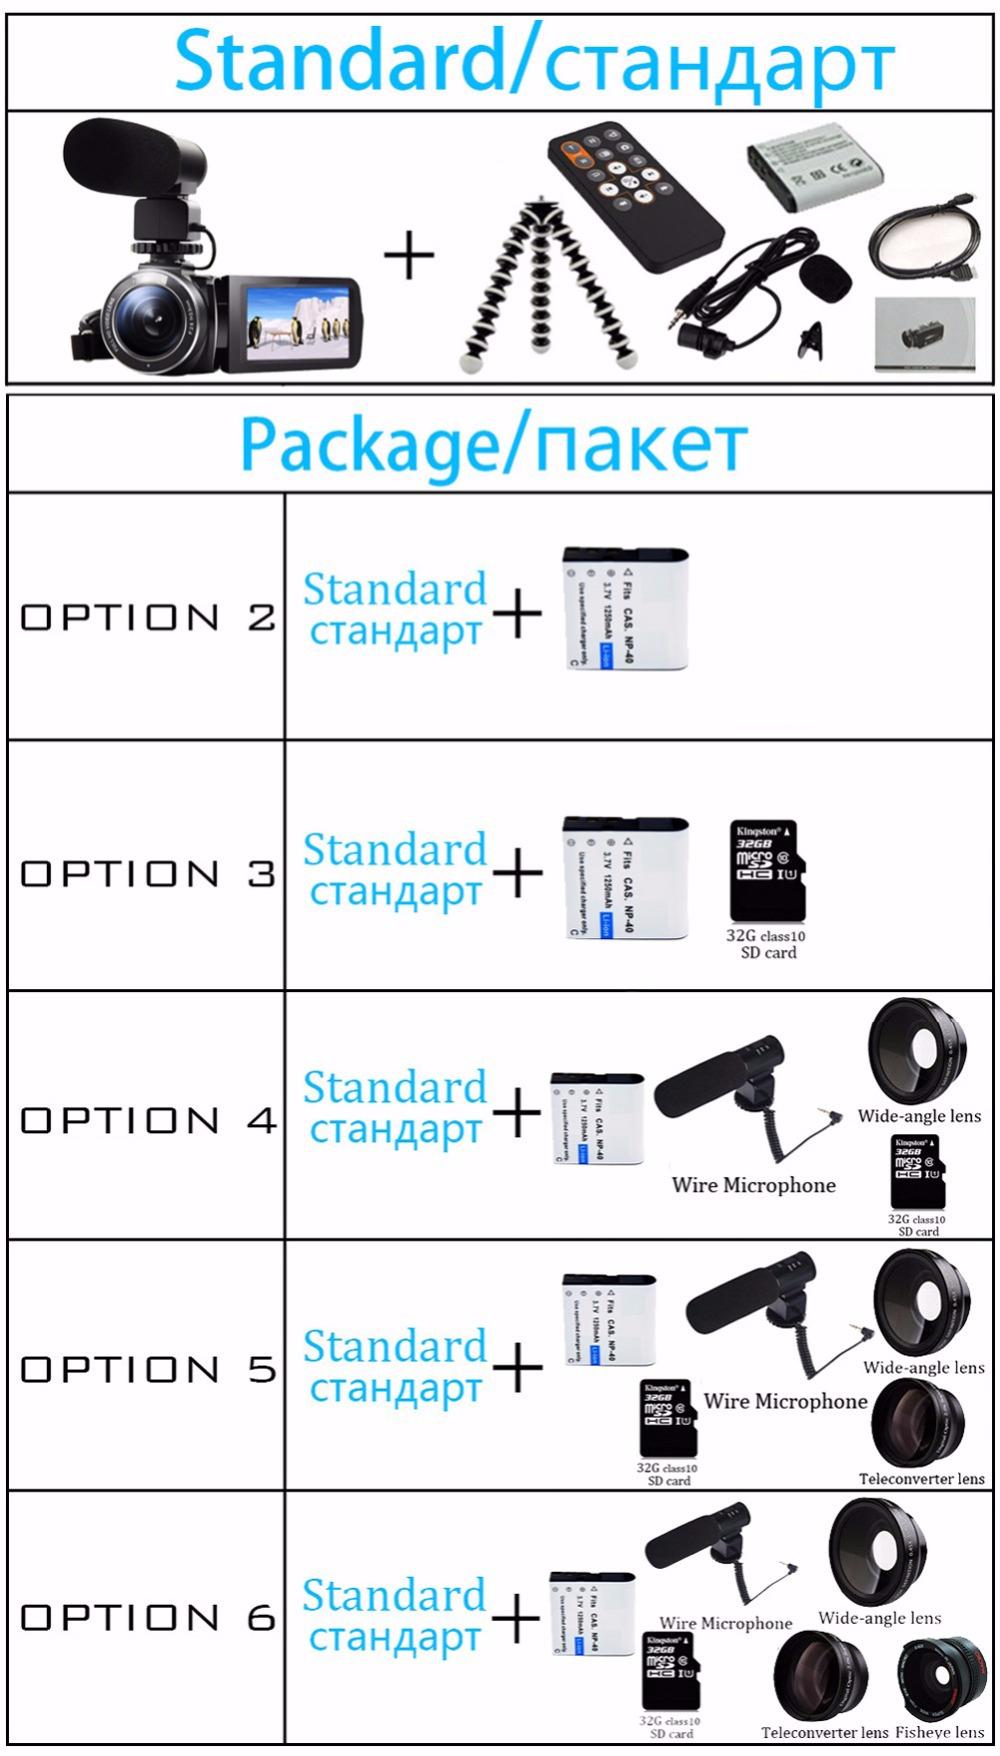 "17 Seree New Arrival FHD 1080P Digital Camera Wifi Video Camcorder 24MP 16x Zoom COMS Sensor 270 Degree 3.0"" LCD Screen 2"